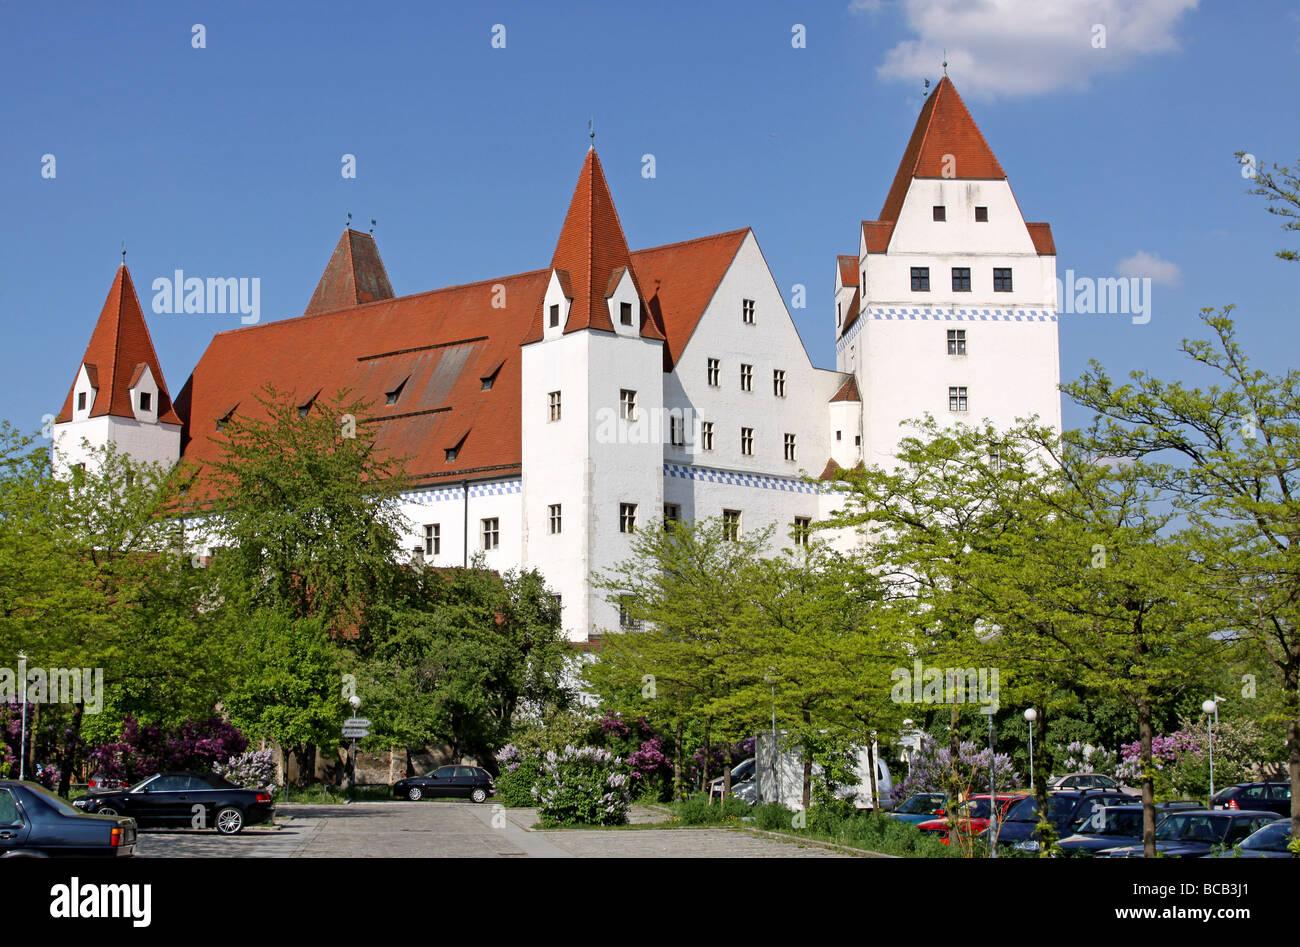 Neues Schloss, New Castle, Ingolstadt, Bayern, Bavaria, Germany Stock Photo